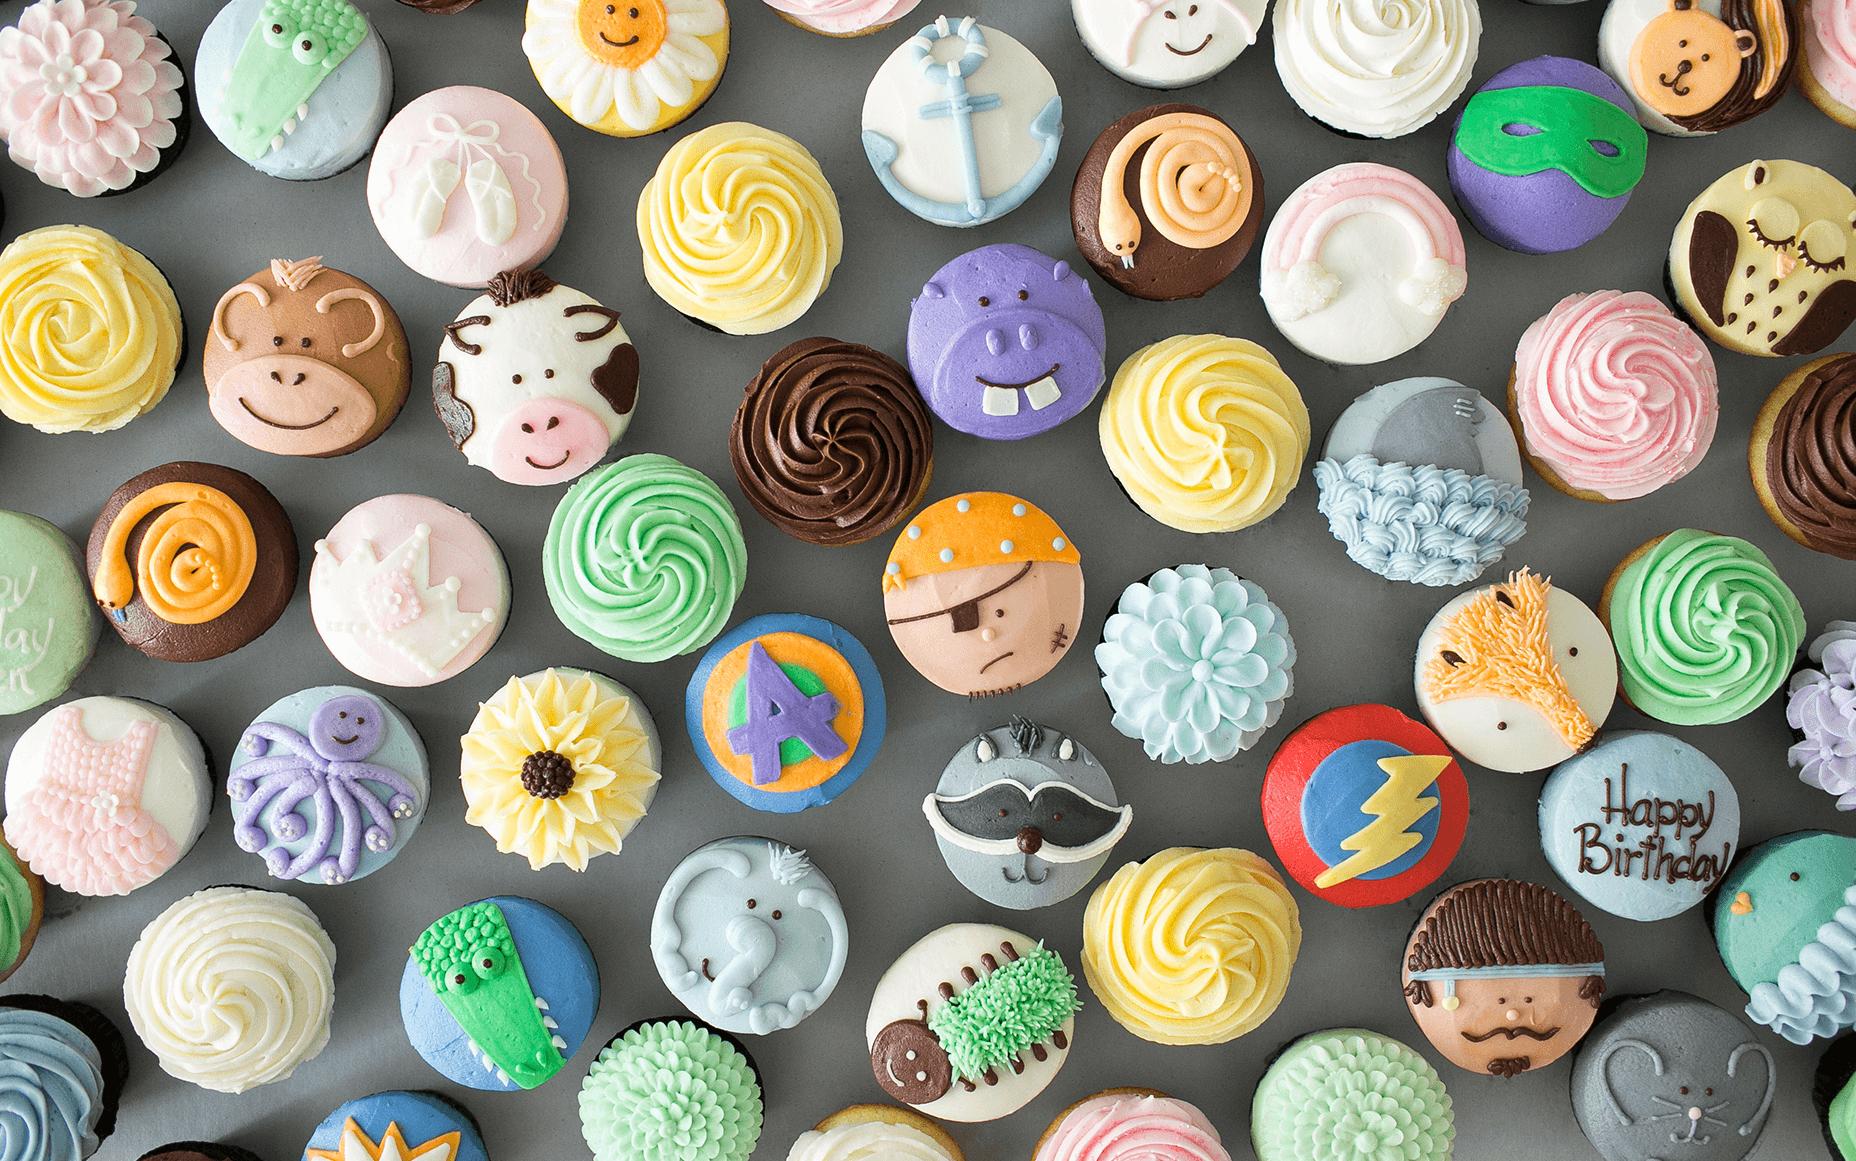 Desktop Wallpaper - Crave Cupcakes